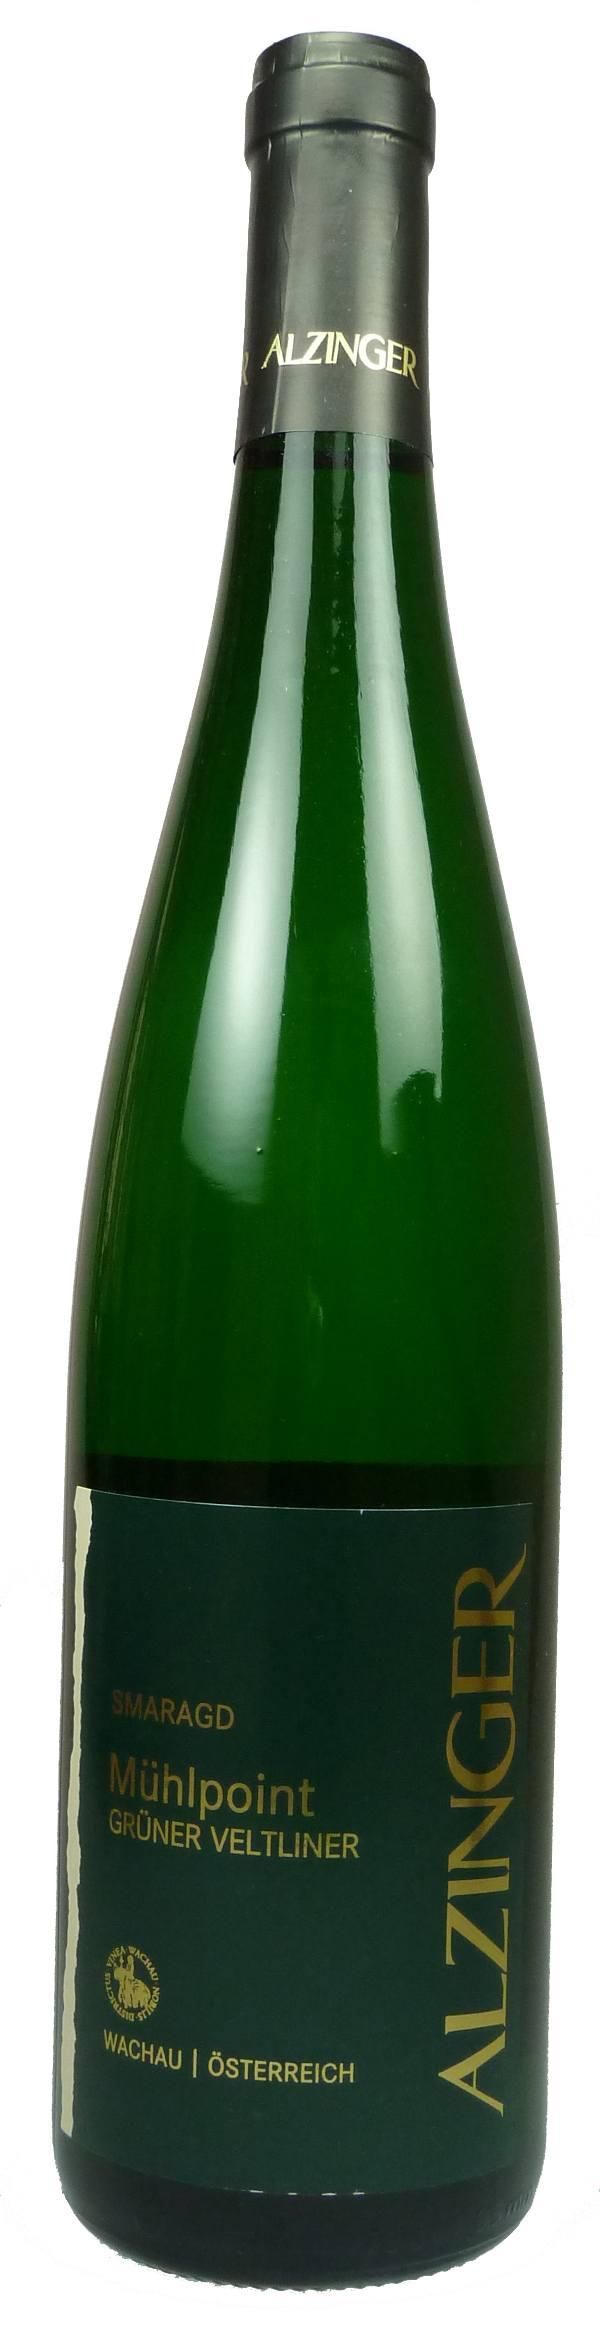 Grüner Veltliner Mühlpoint Smaragd 2016